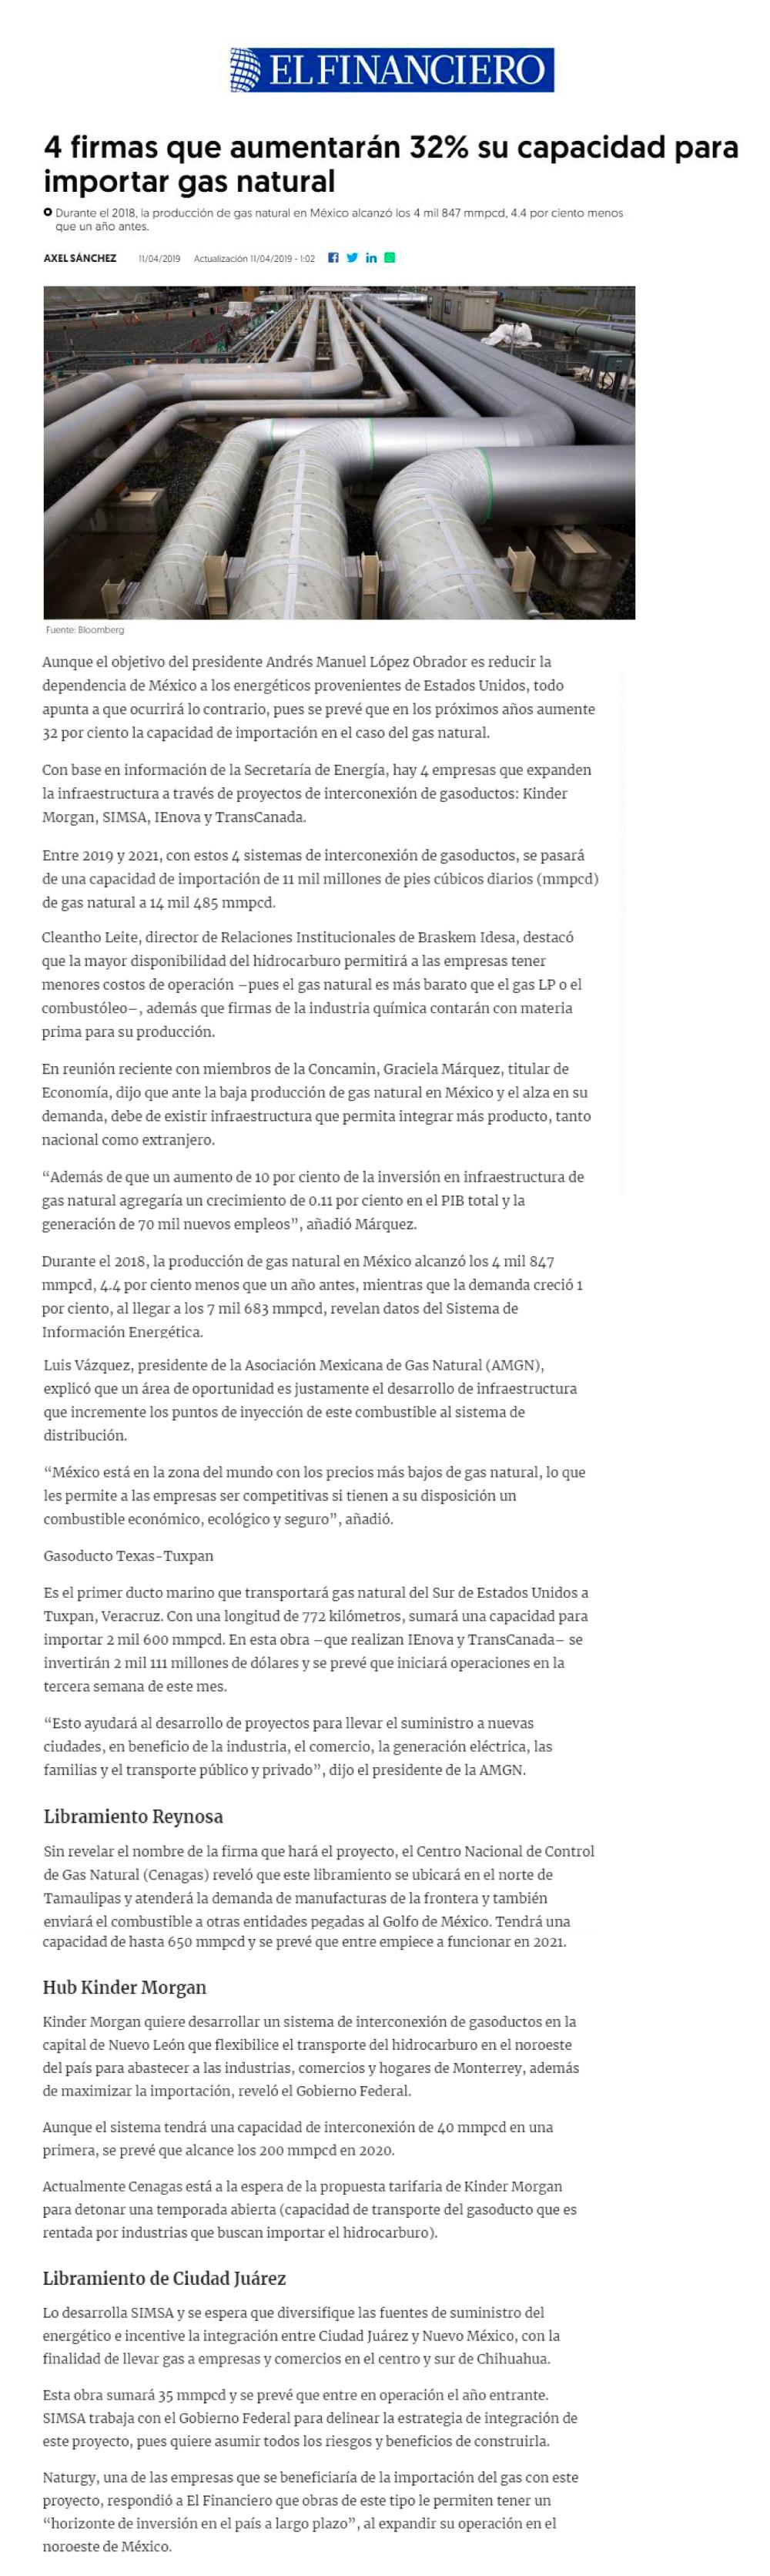 AMGN_Notas_Abril_11_34